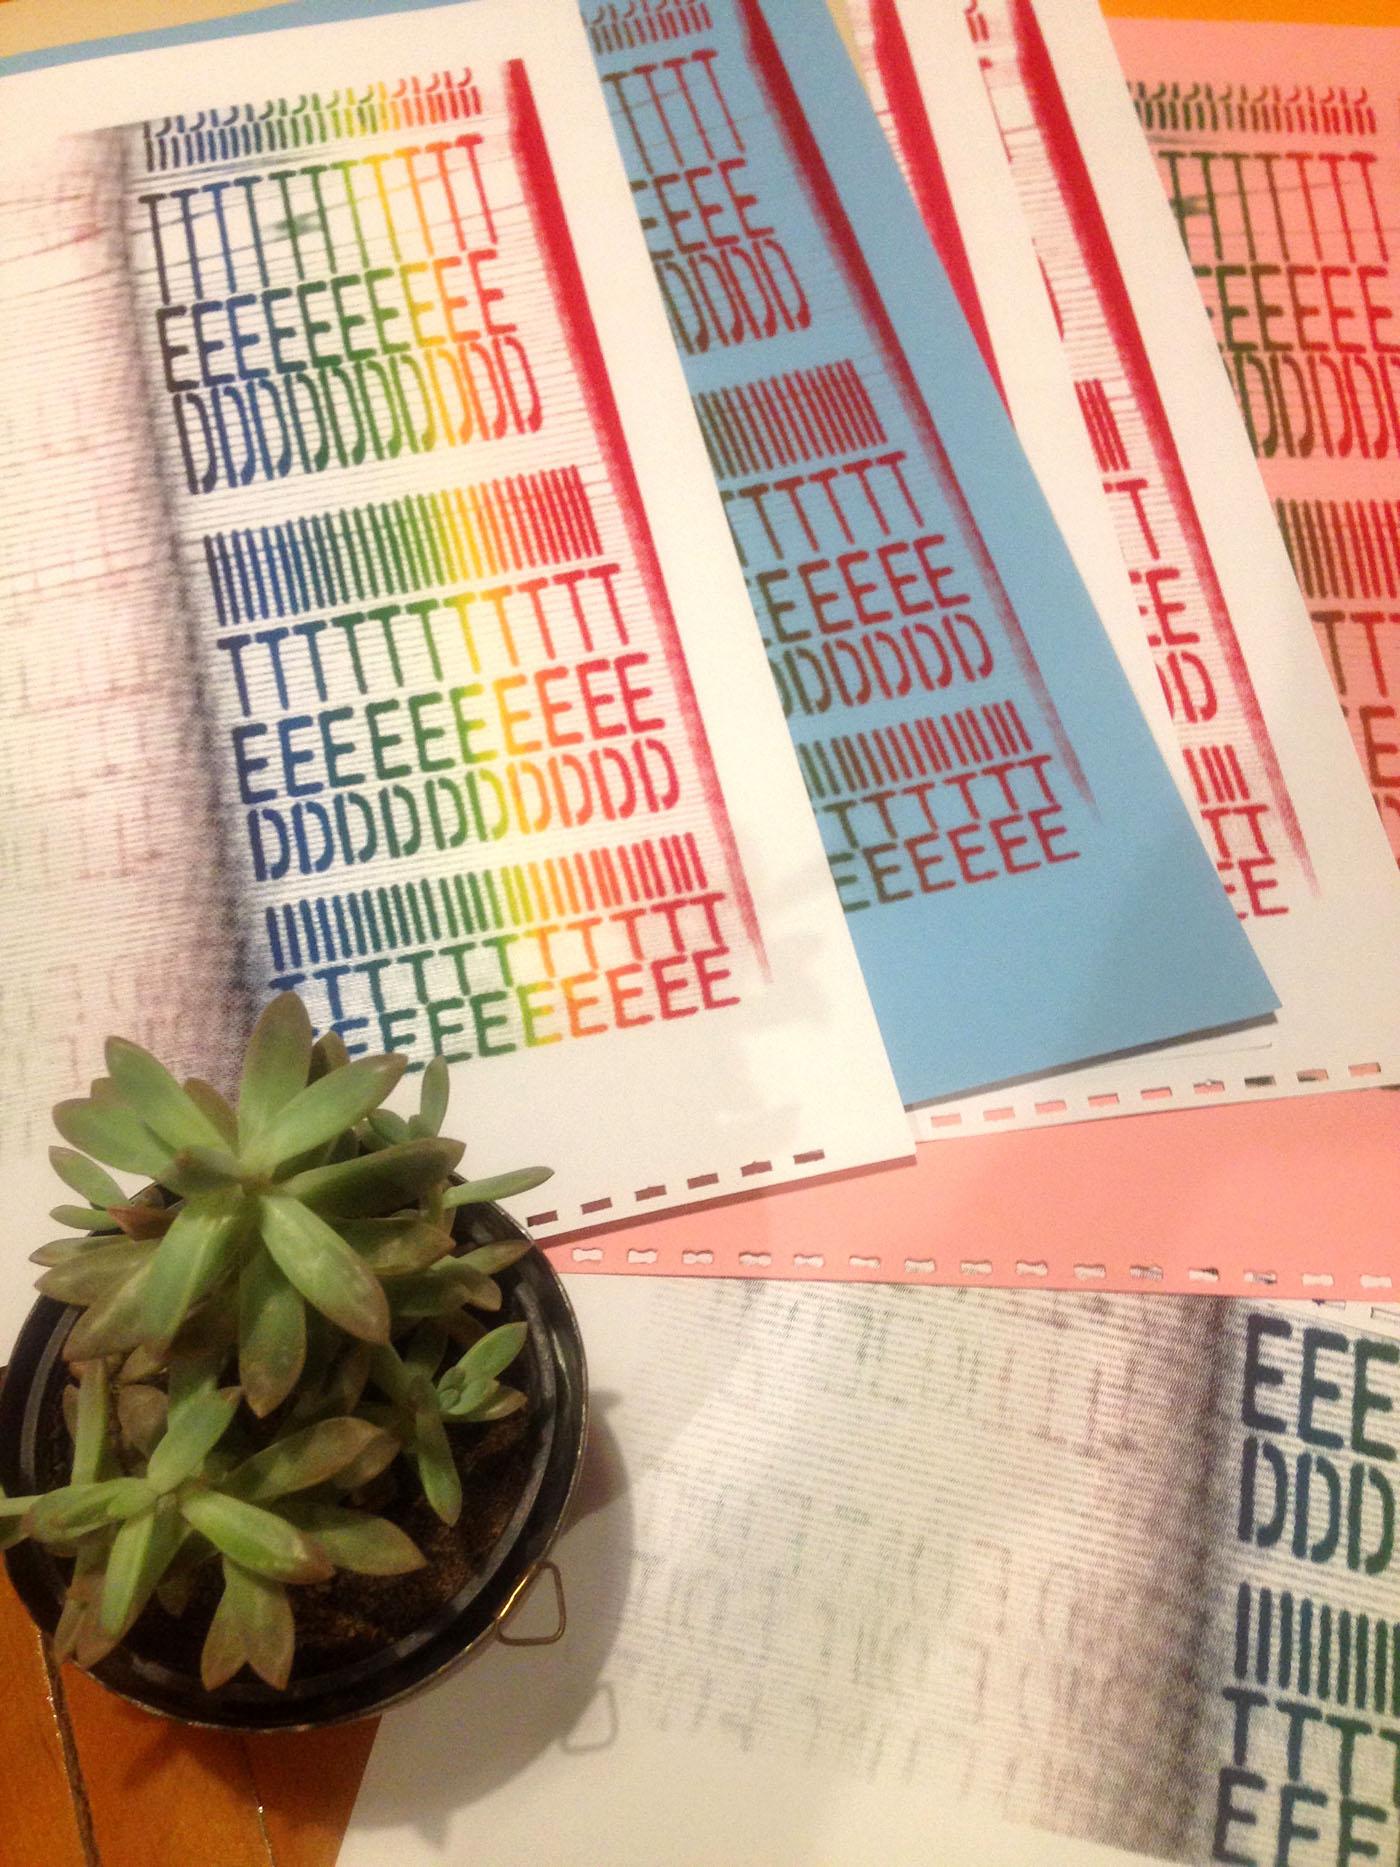 edit design halftone analog letraset moleskine monochrome poster